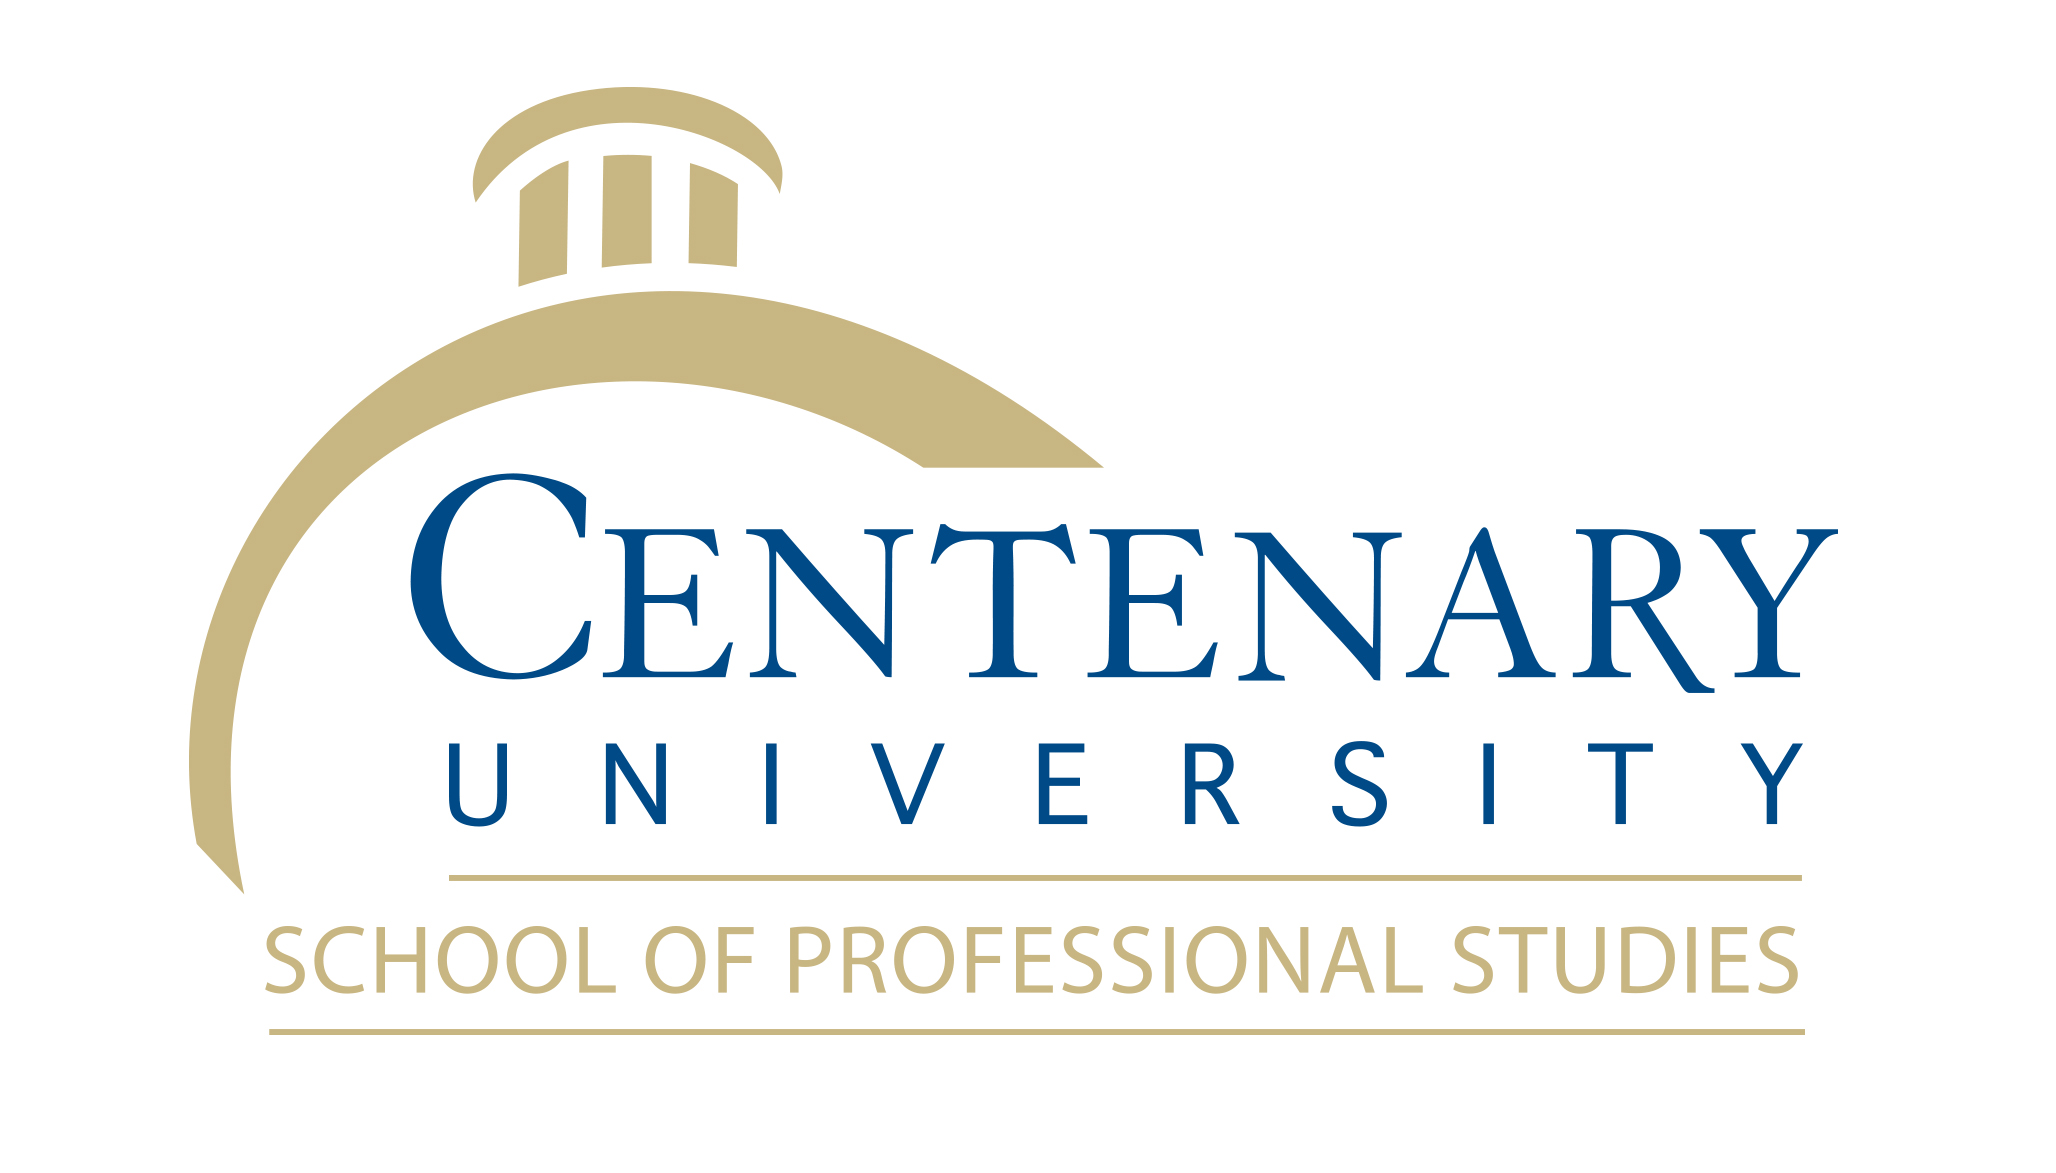 EdAssist | School of Professional Studies · School of Professional